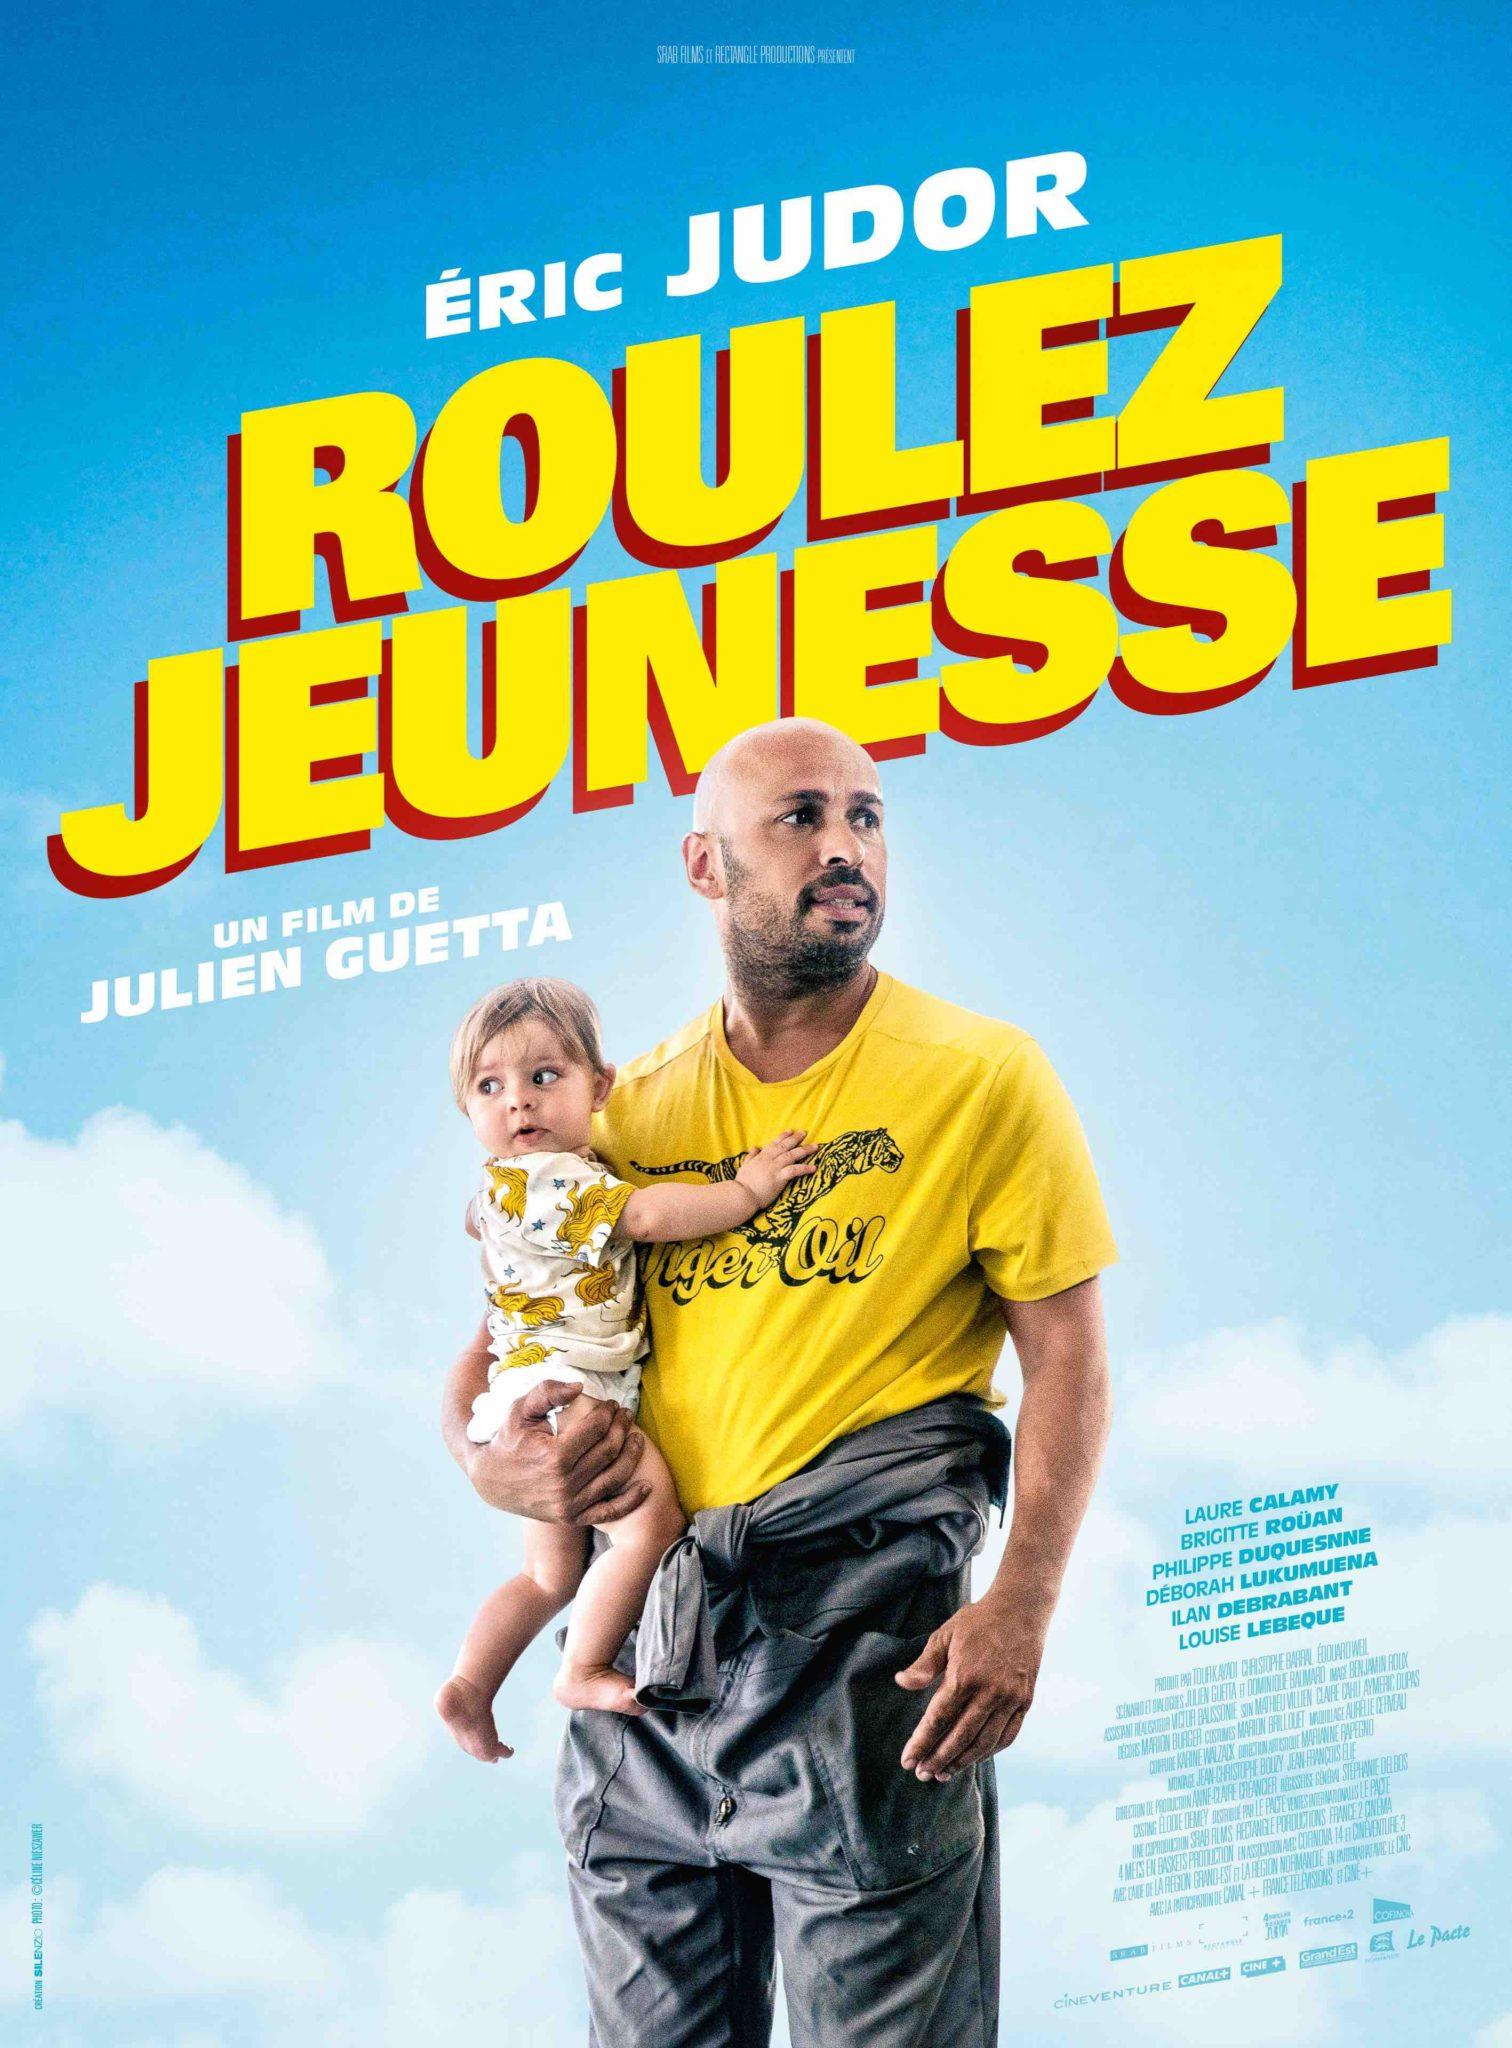 Roulez jeunesse du Julien Guetta